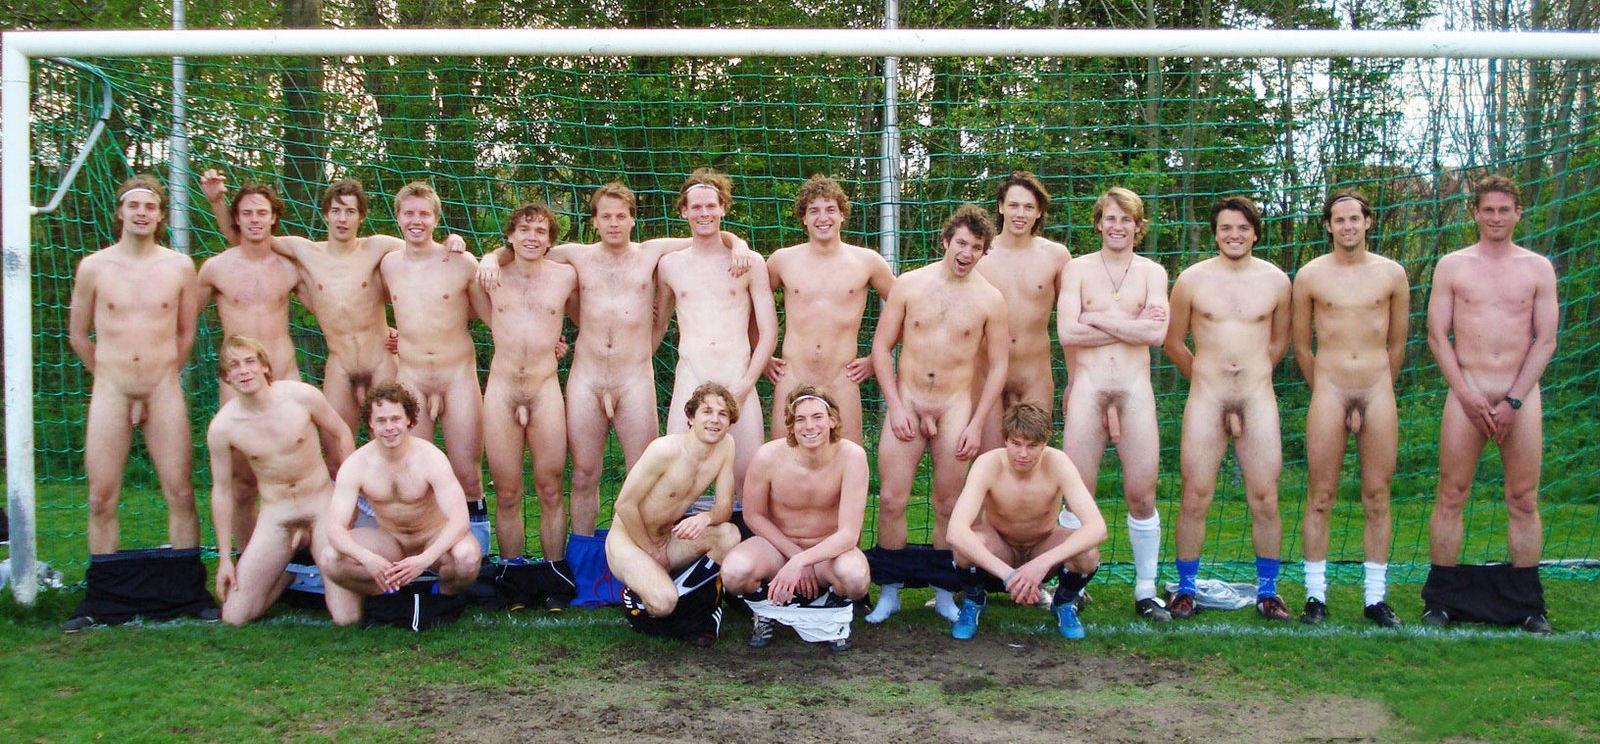 Desnudo género artístico - Wikipedia, la enciclopedia